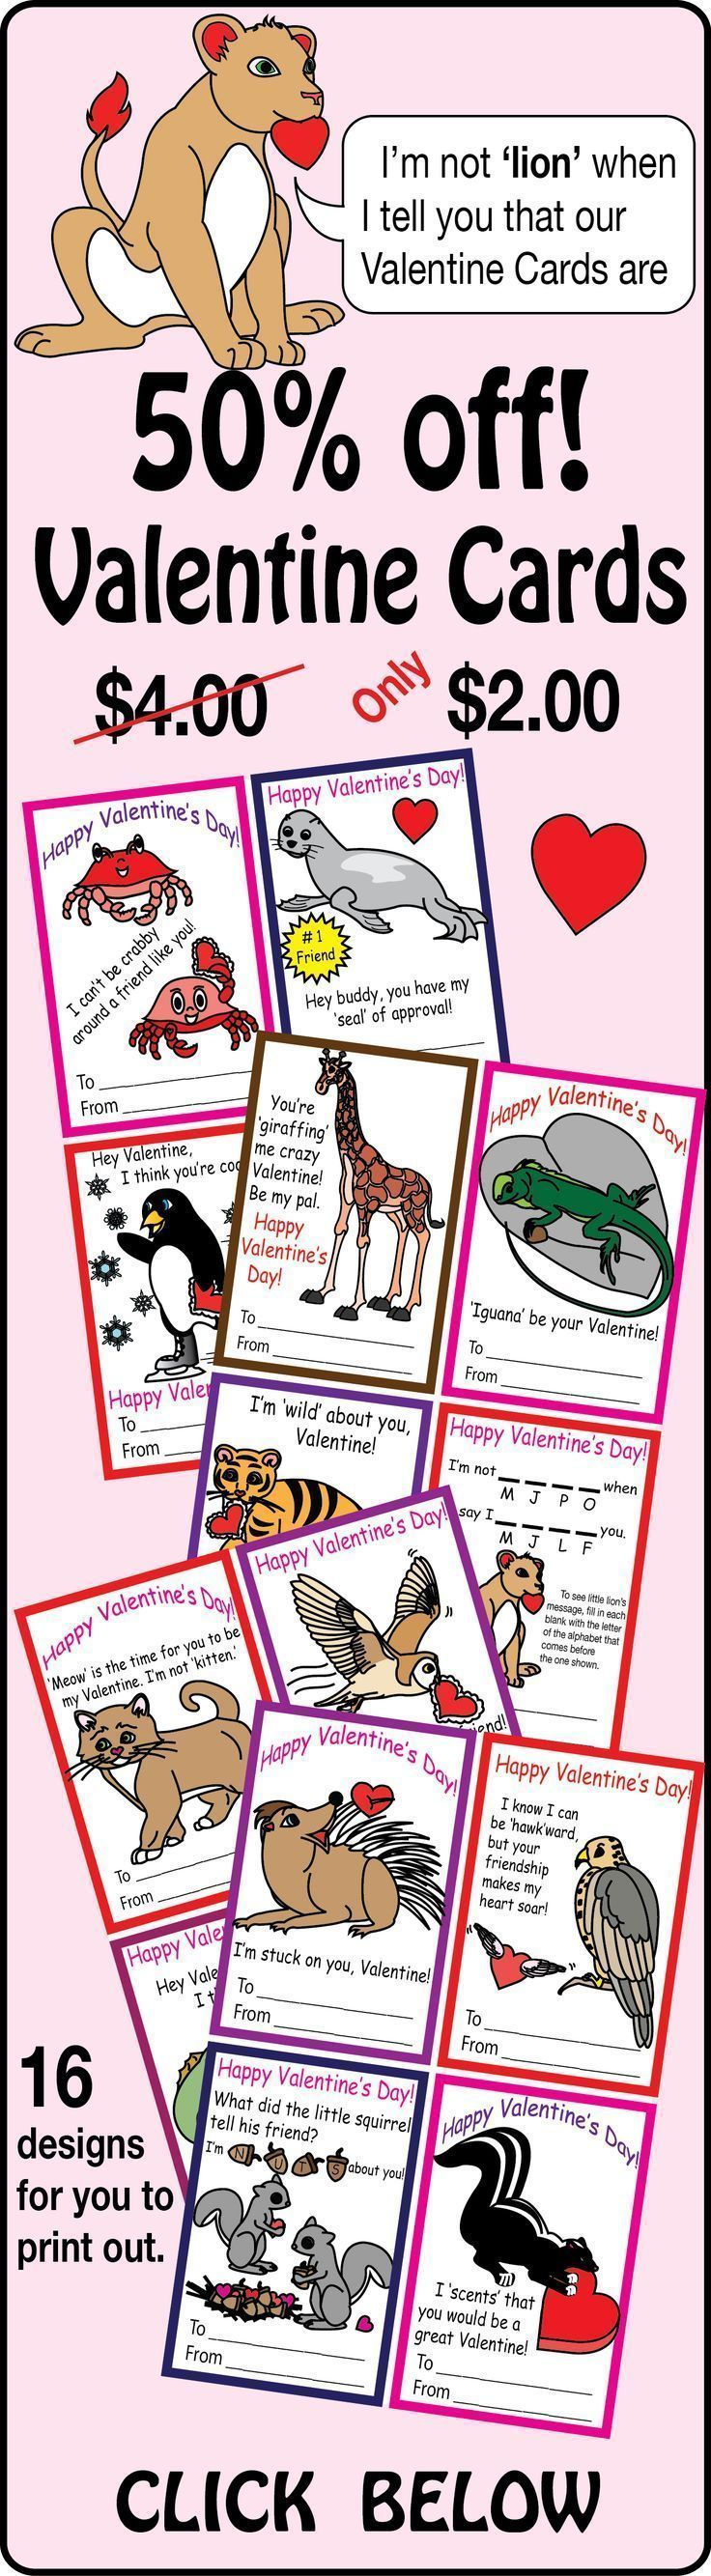 https://www.teacherspayteachers.com/Product/Valentines-Day-and-Friendship-Cut-Out-Valentine-Cards-2348764?aref=y4fpsmjk